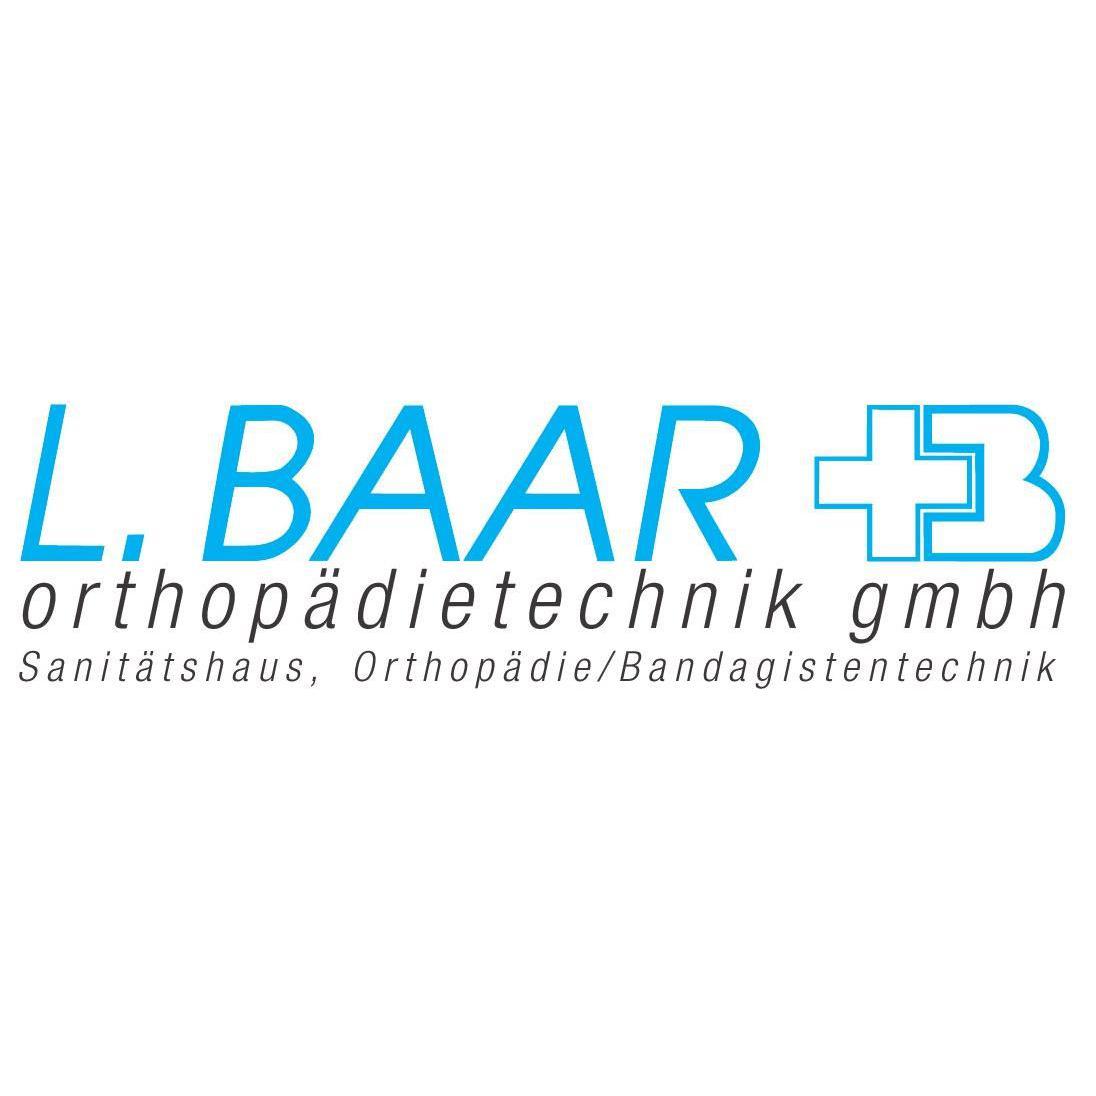 Logo von Baar L. Orthopädietechnik GmbH